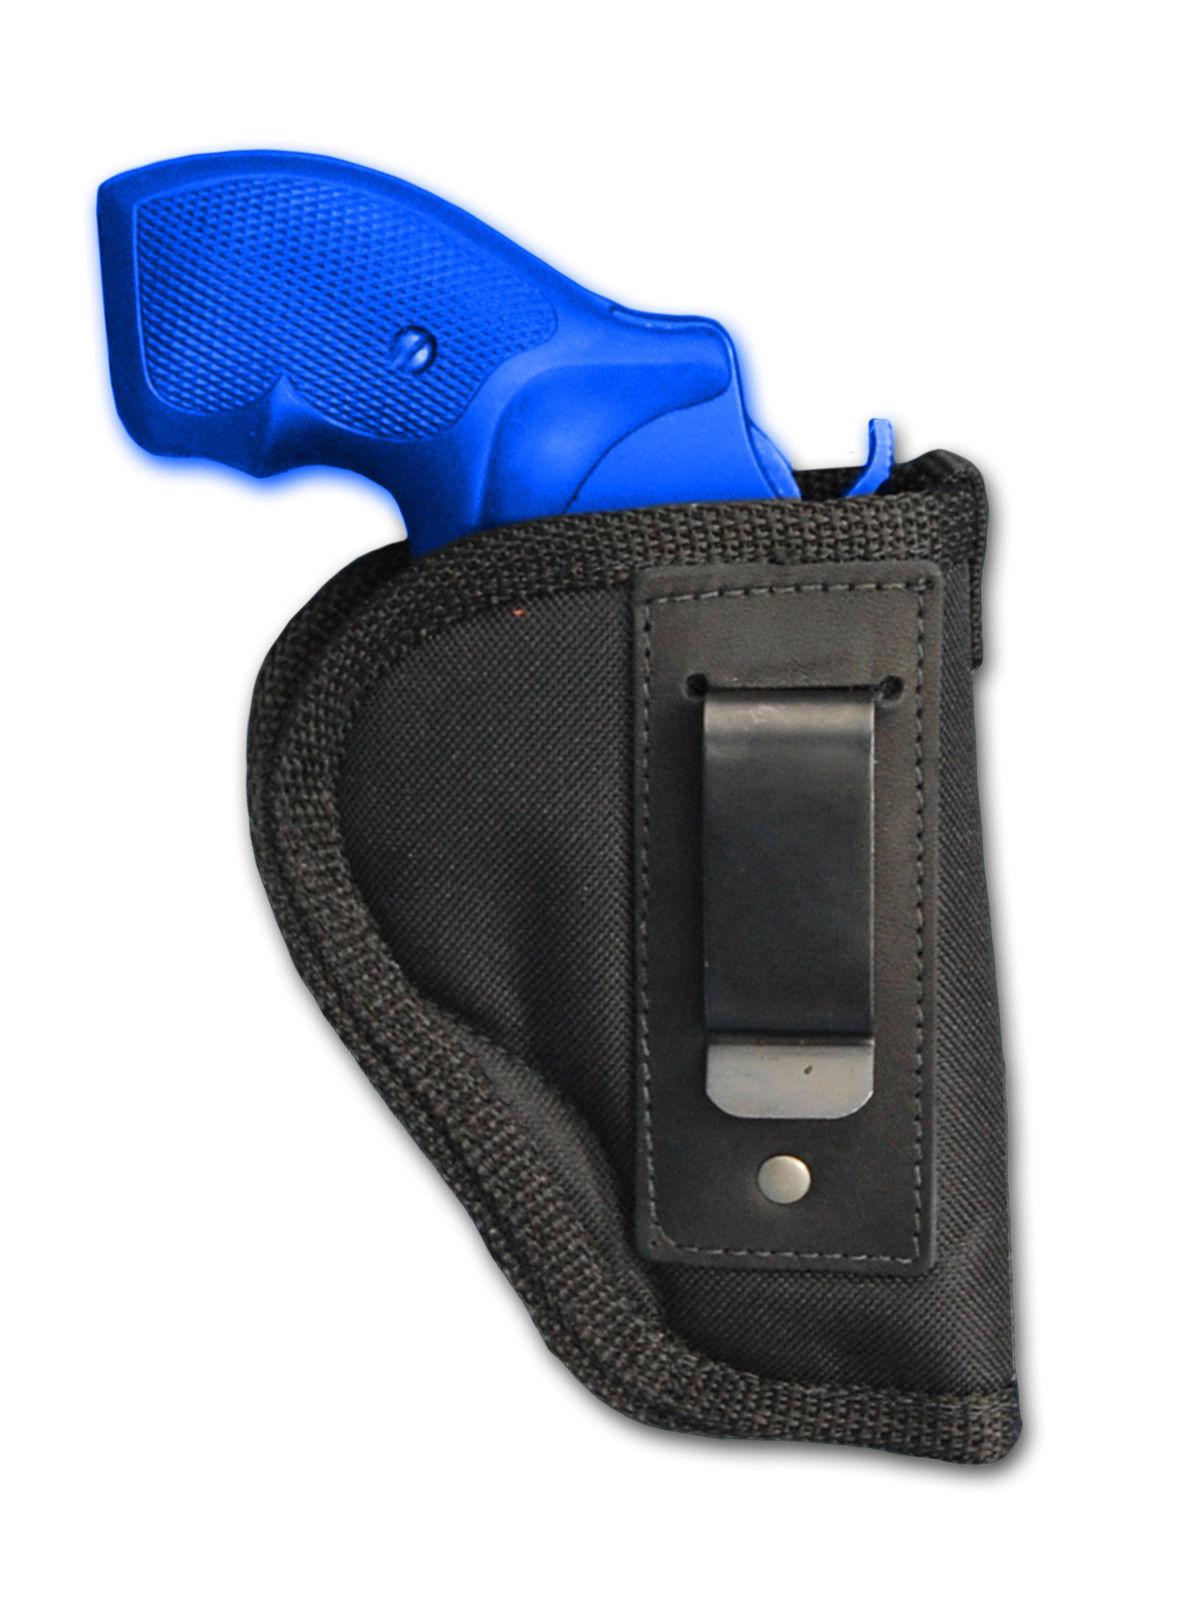 "Barsony IWB Gun Concealment Holster for Rossi, EAA 2"" Snub Nose Revolver Pistols"